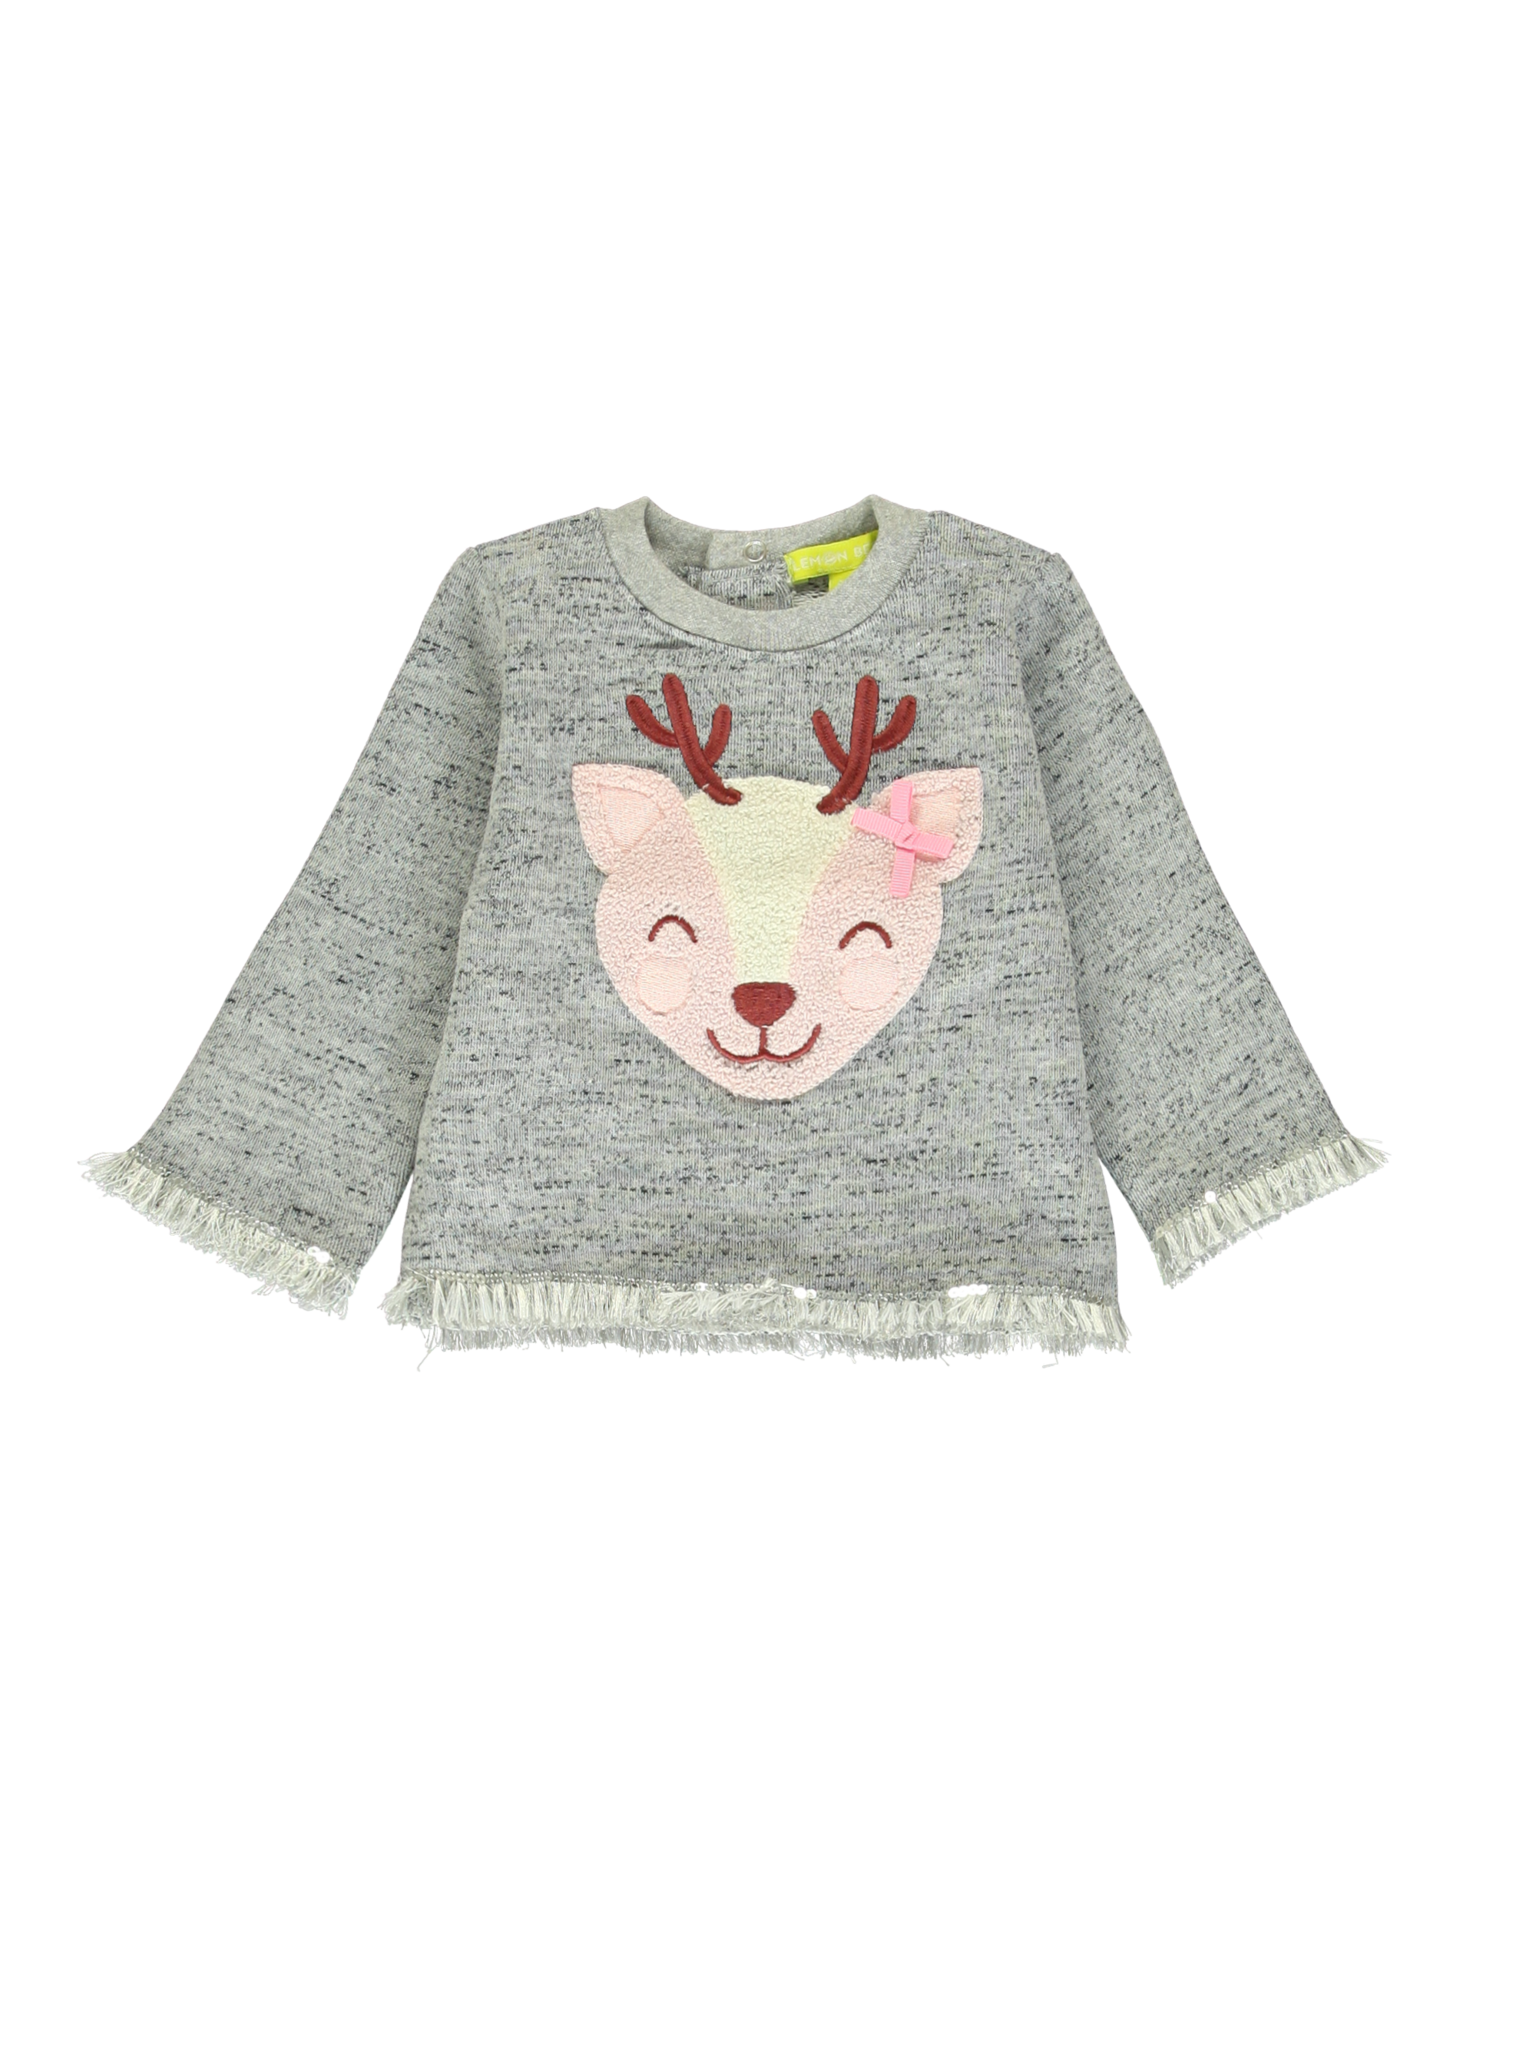 All Brands | Winterproducts Baby | Sweatshirt | 8 pcs/box